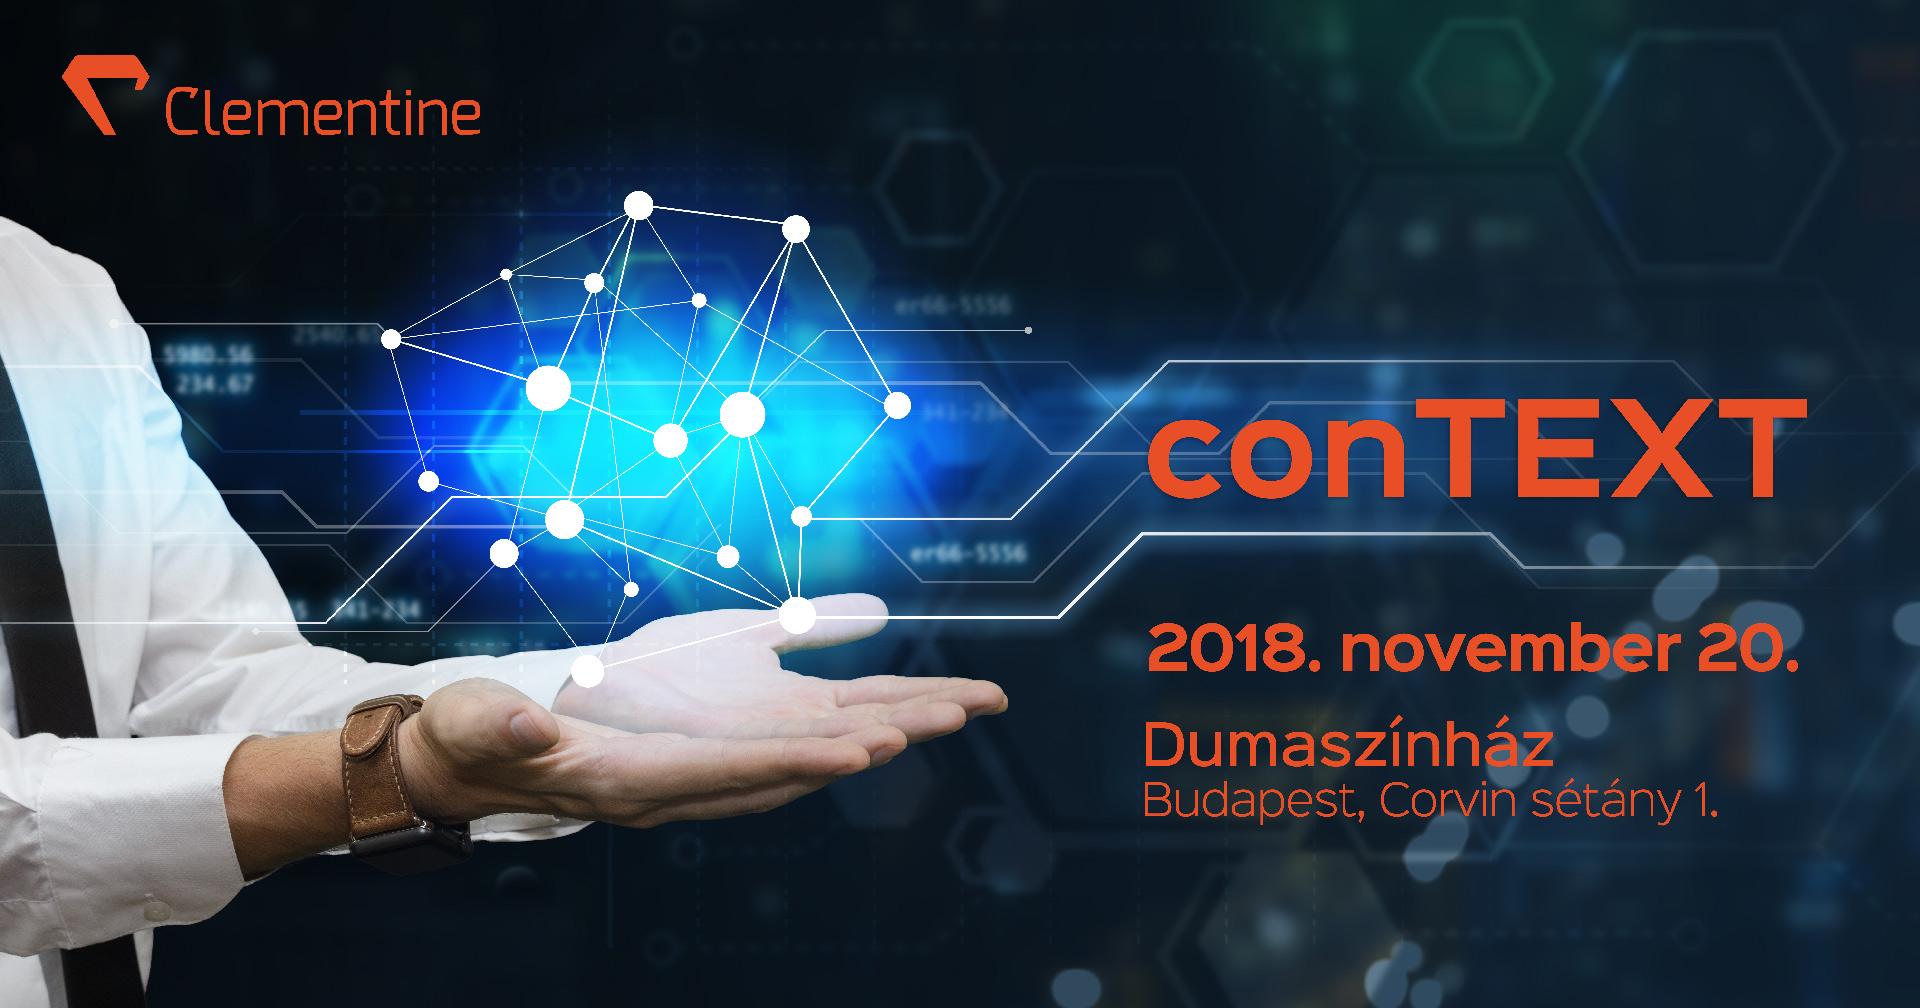 conTEXT 2018 image